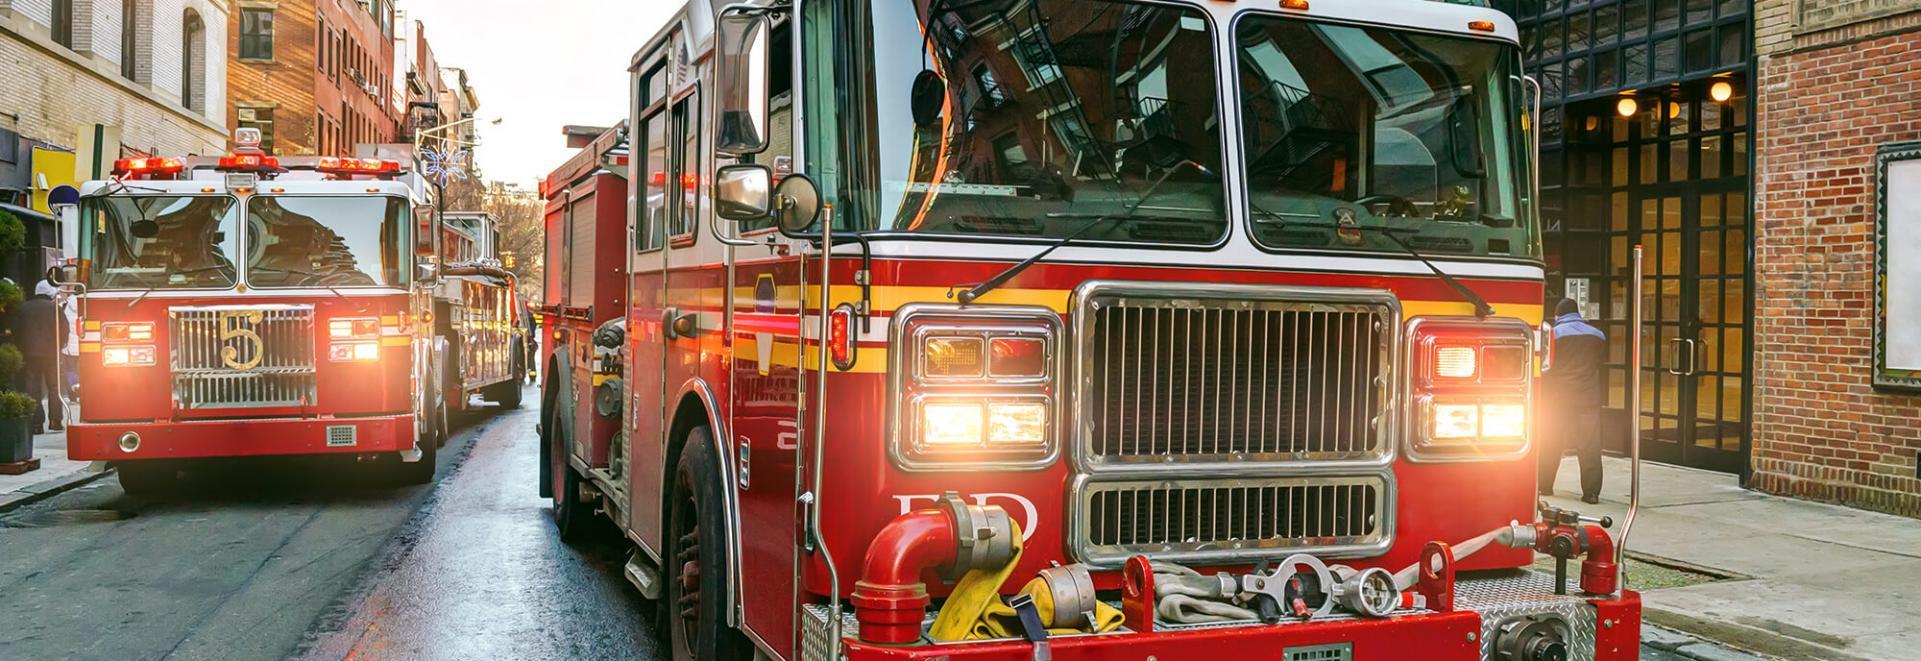 Fire trucks on a city street - Tulane School of Professional Advancement